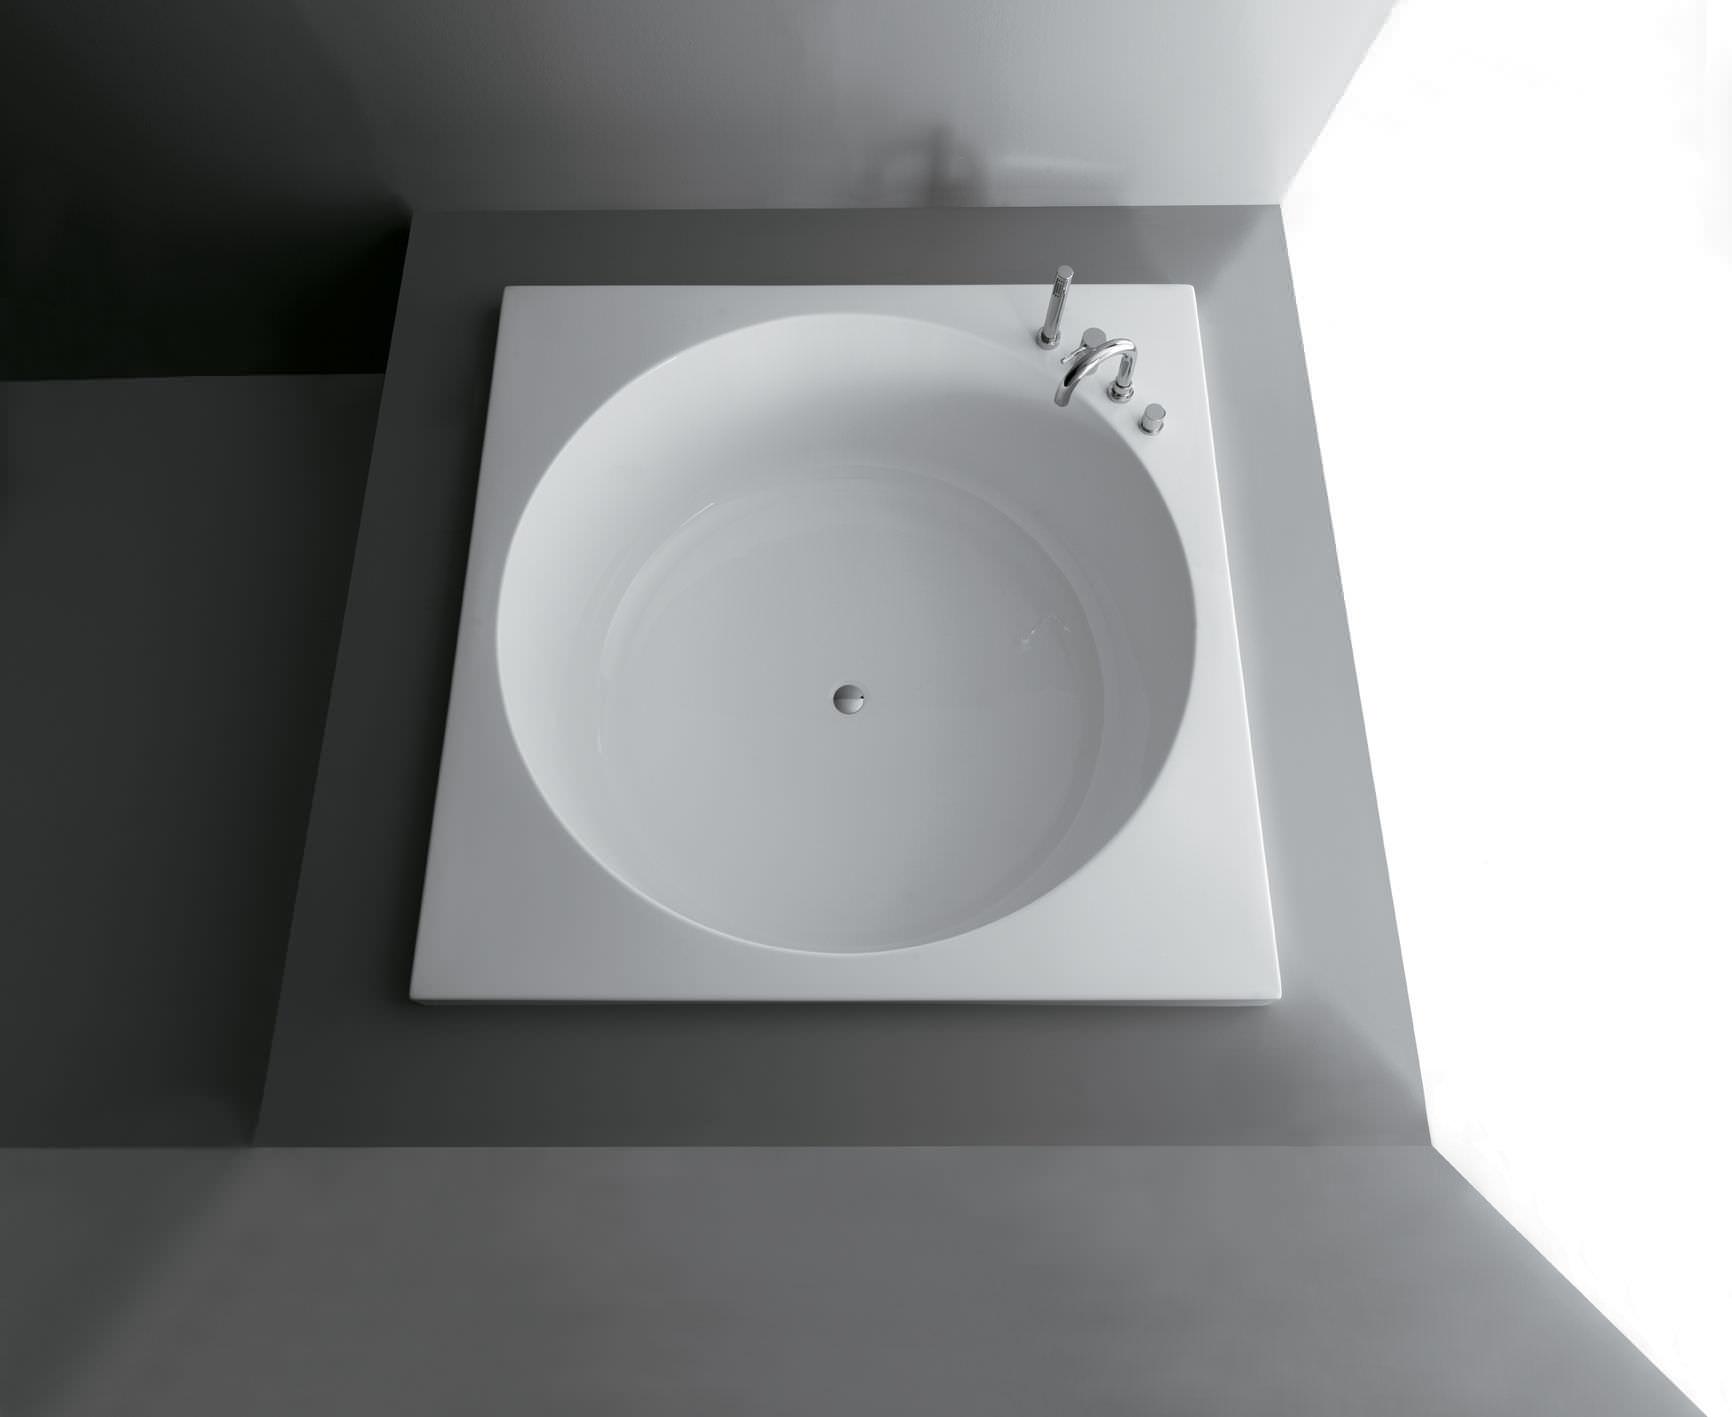 Quadratische Badewanne quadratische badewanne aus acryl sharm by alessandro paolelli